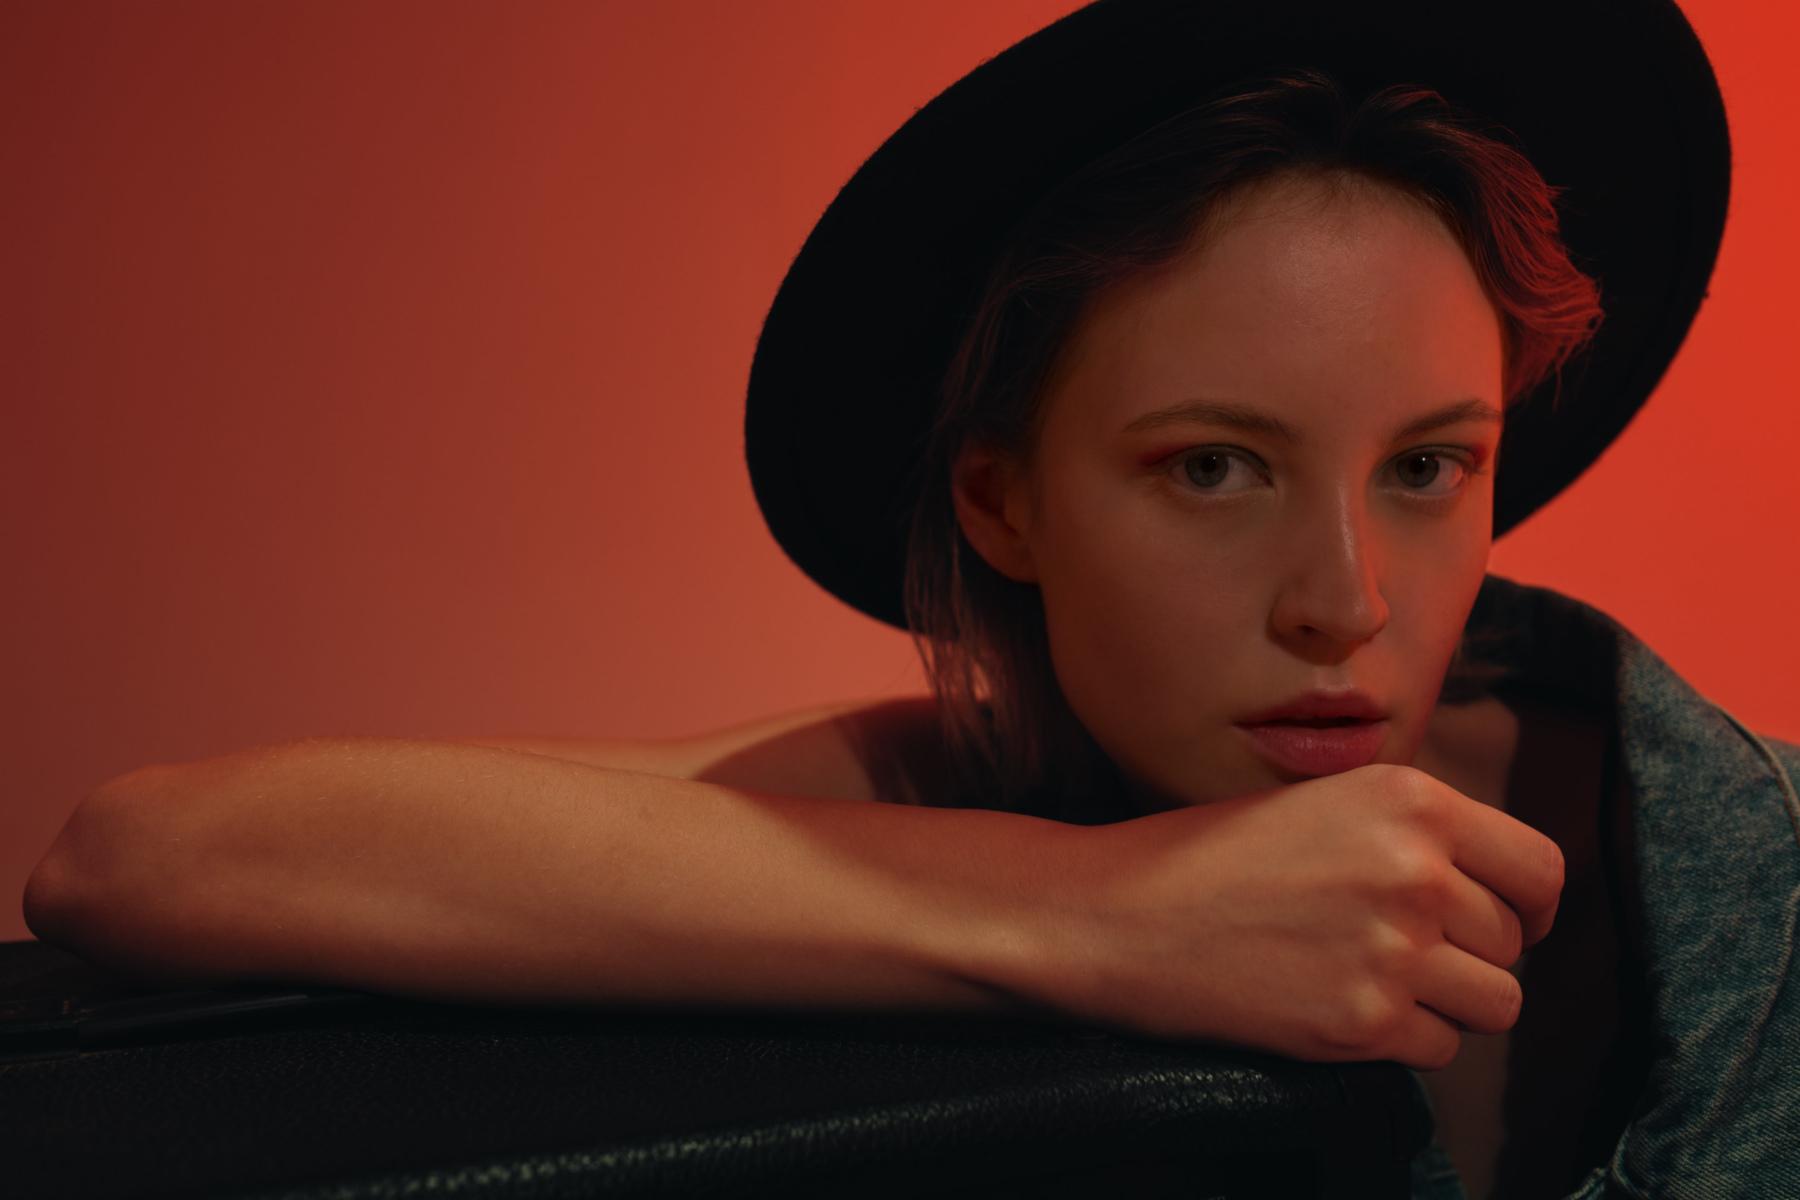 Magdalena for Solstice magazine